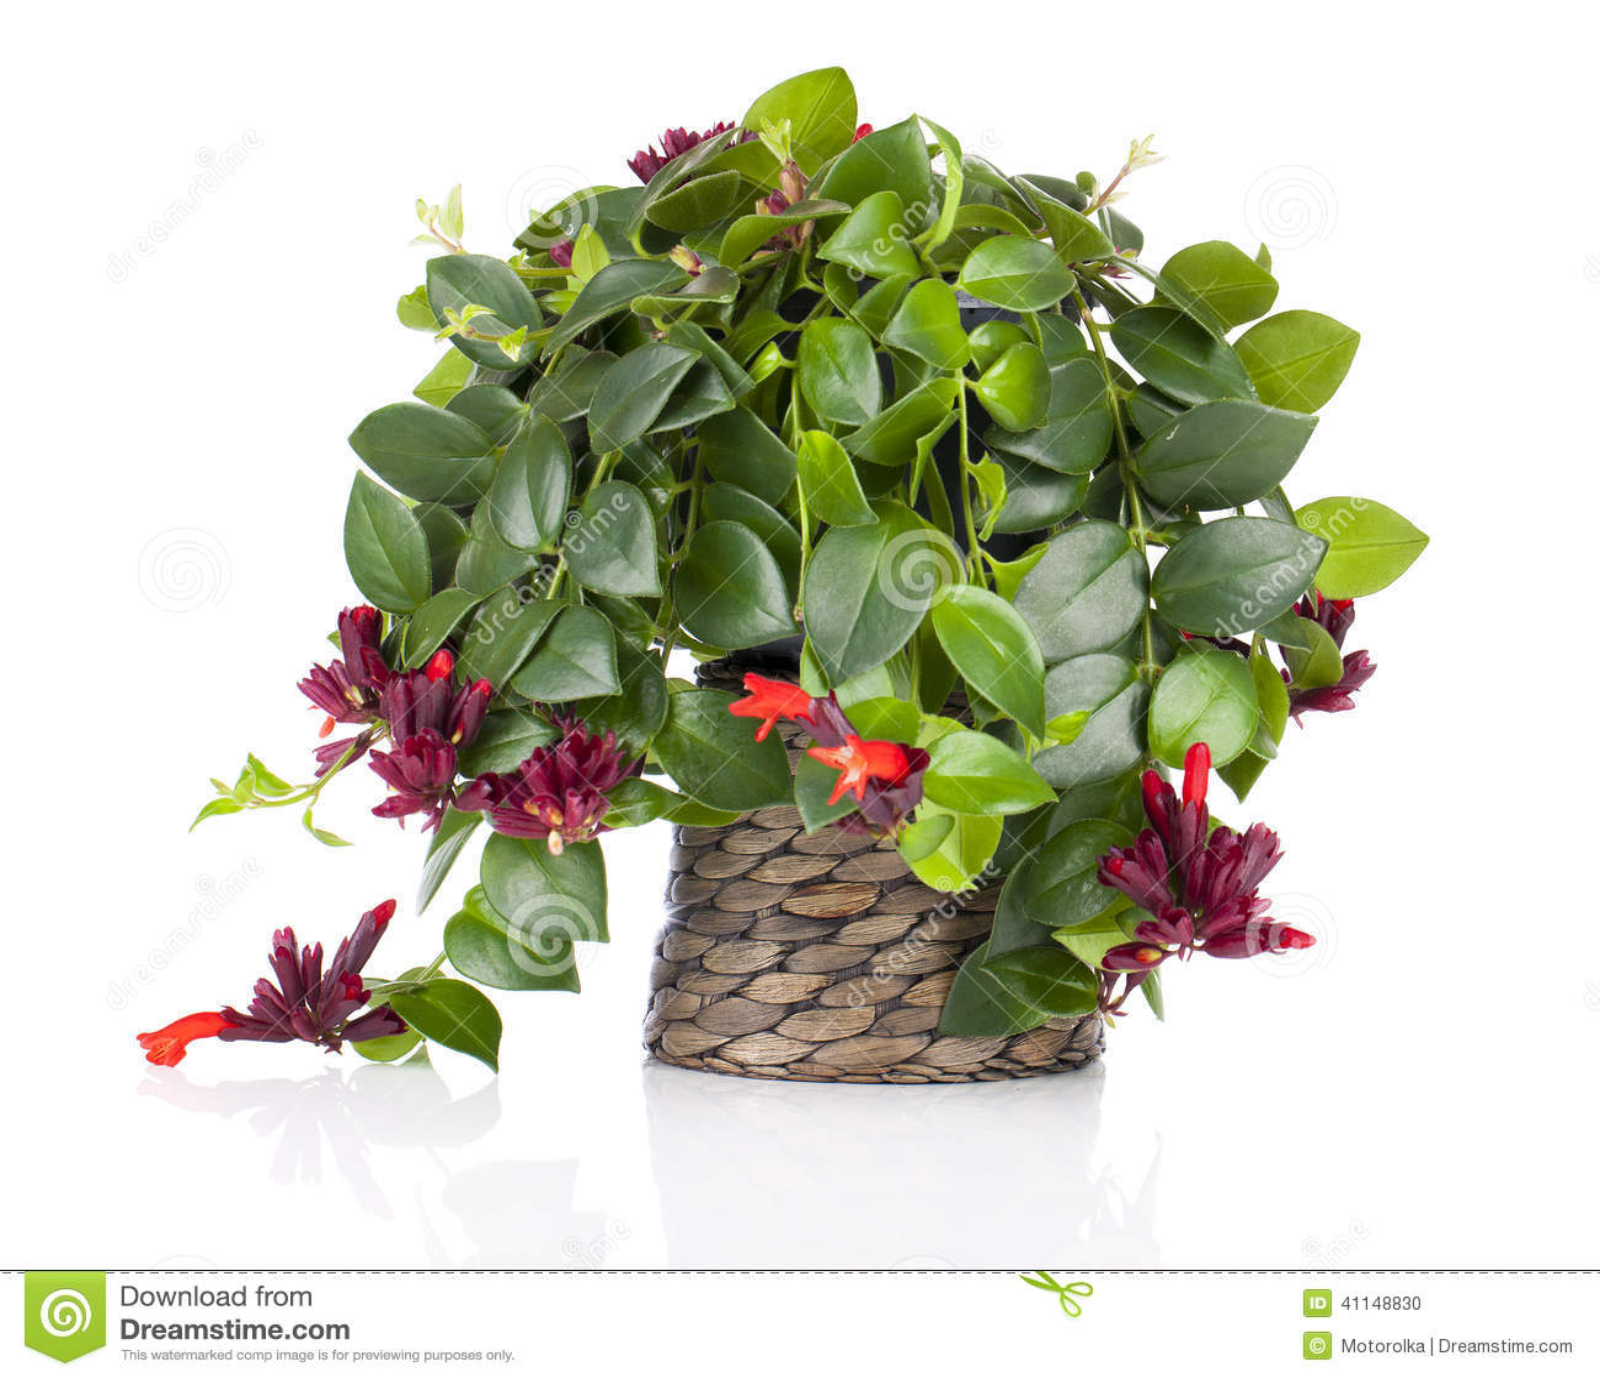 lipstick plant  aeschynanthus radicans  in pot  stock